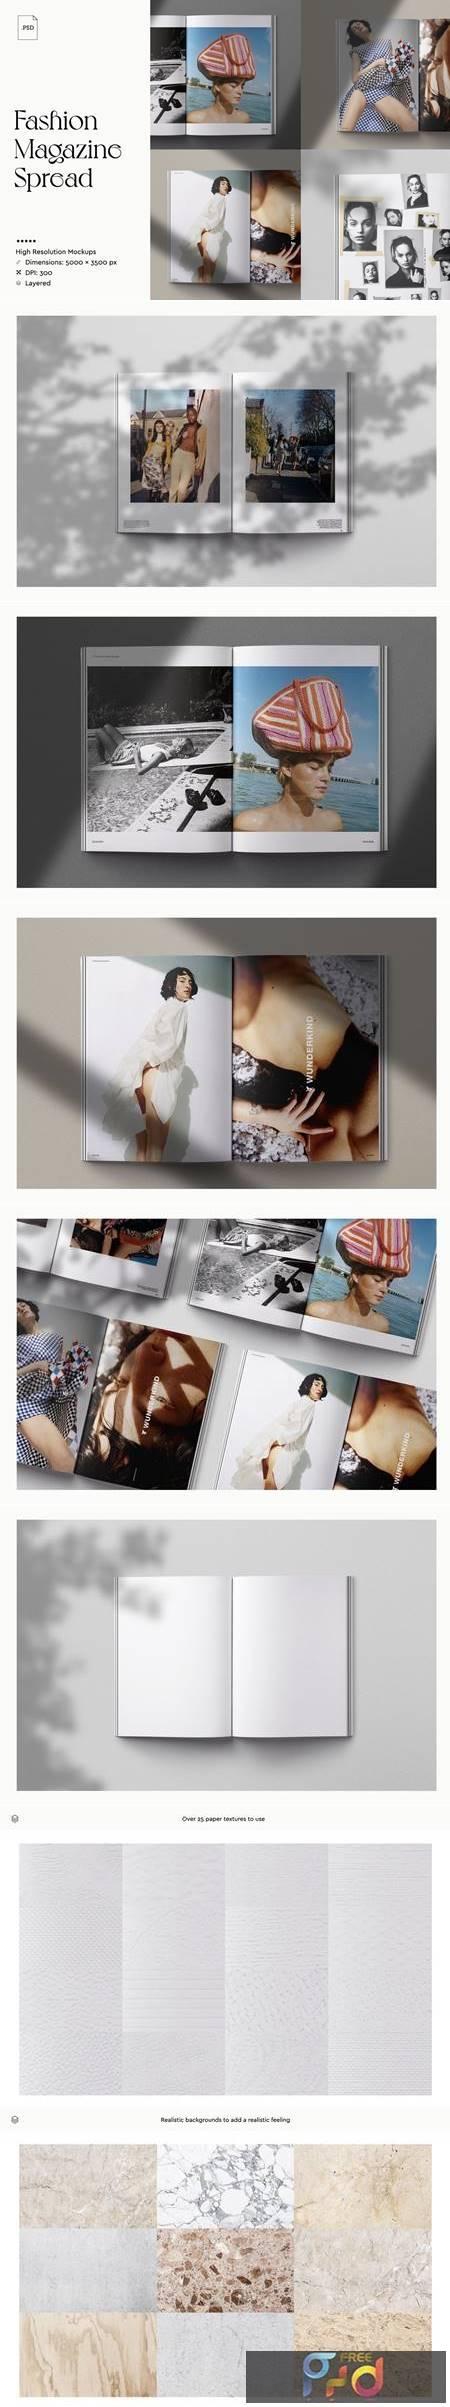 Magazine Spread Mockup 3739343 1